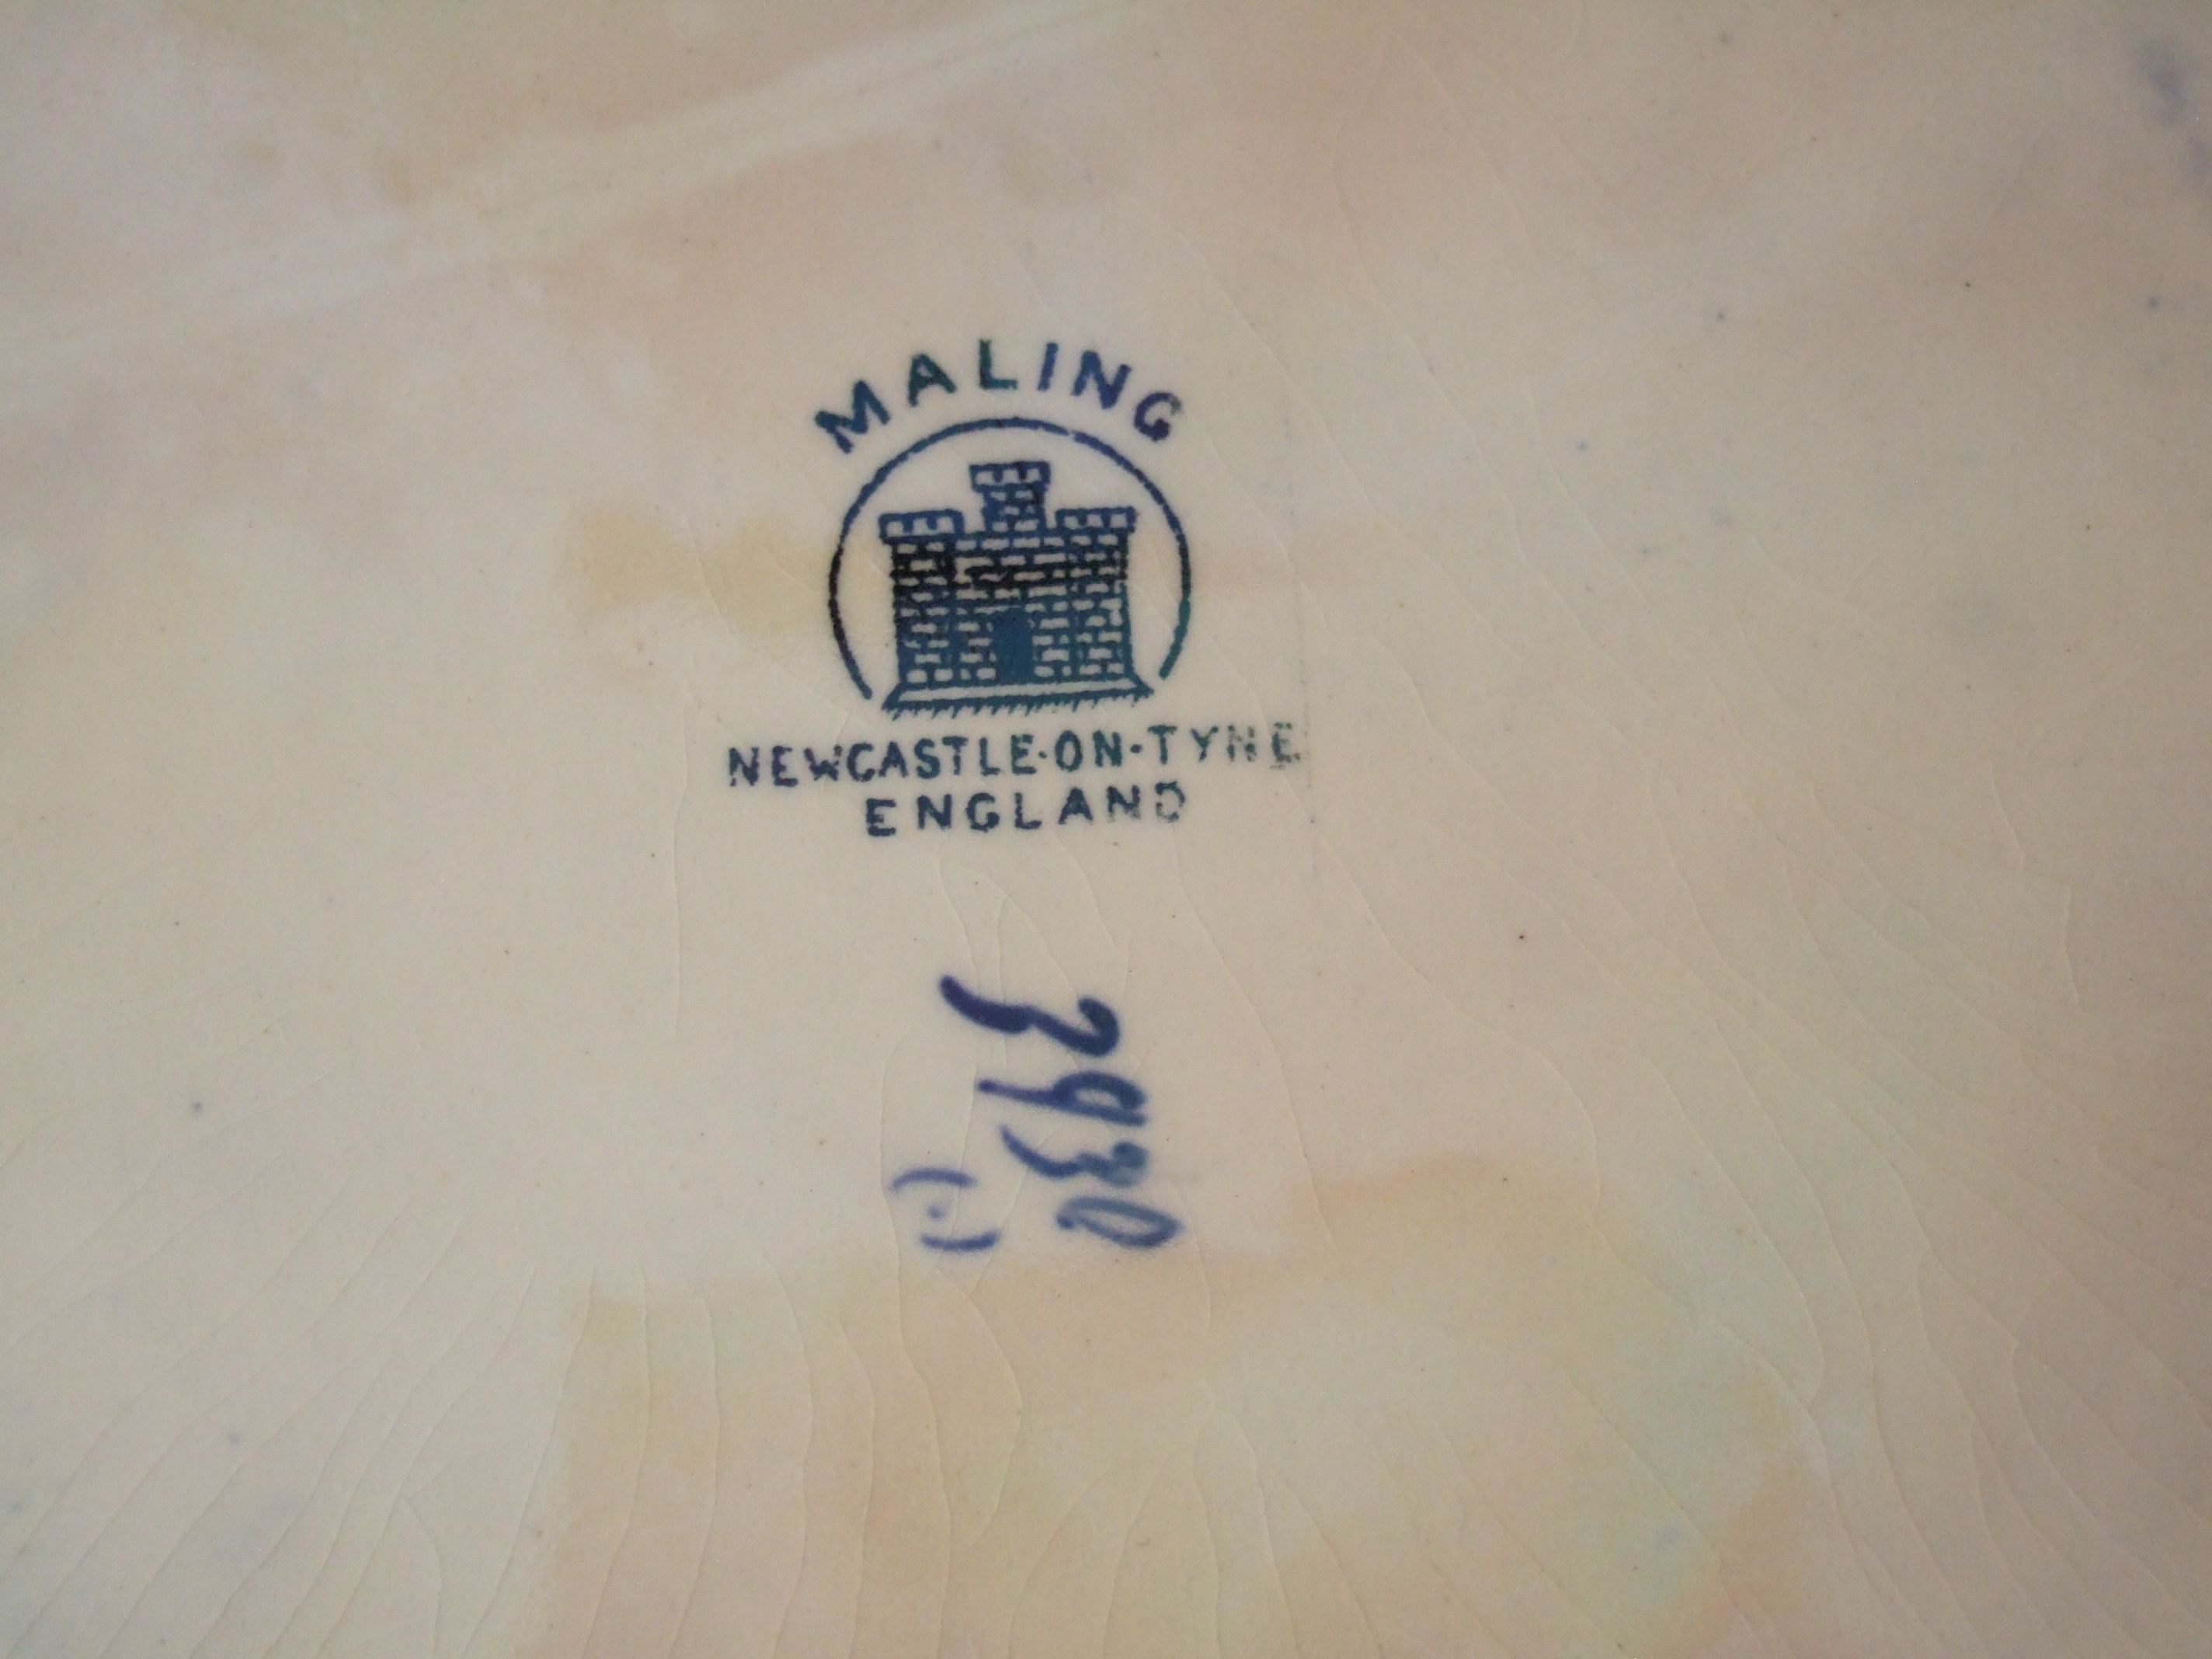 Tattoo name writing designs  maling pottery fantasy windmill pattern bowl octagonal on feet